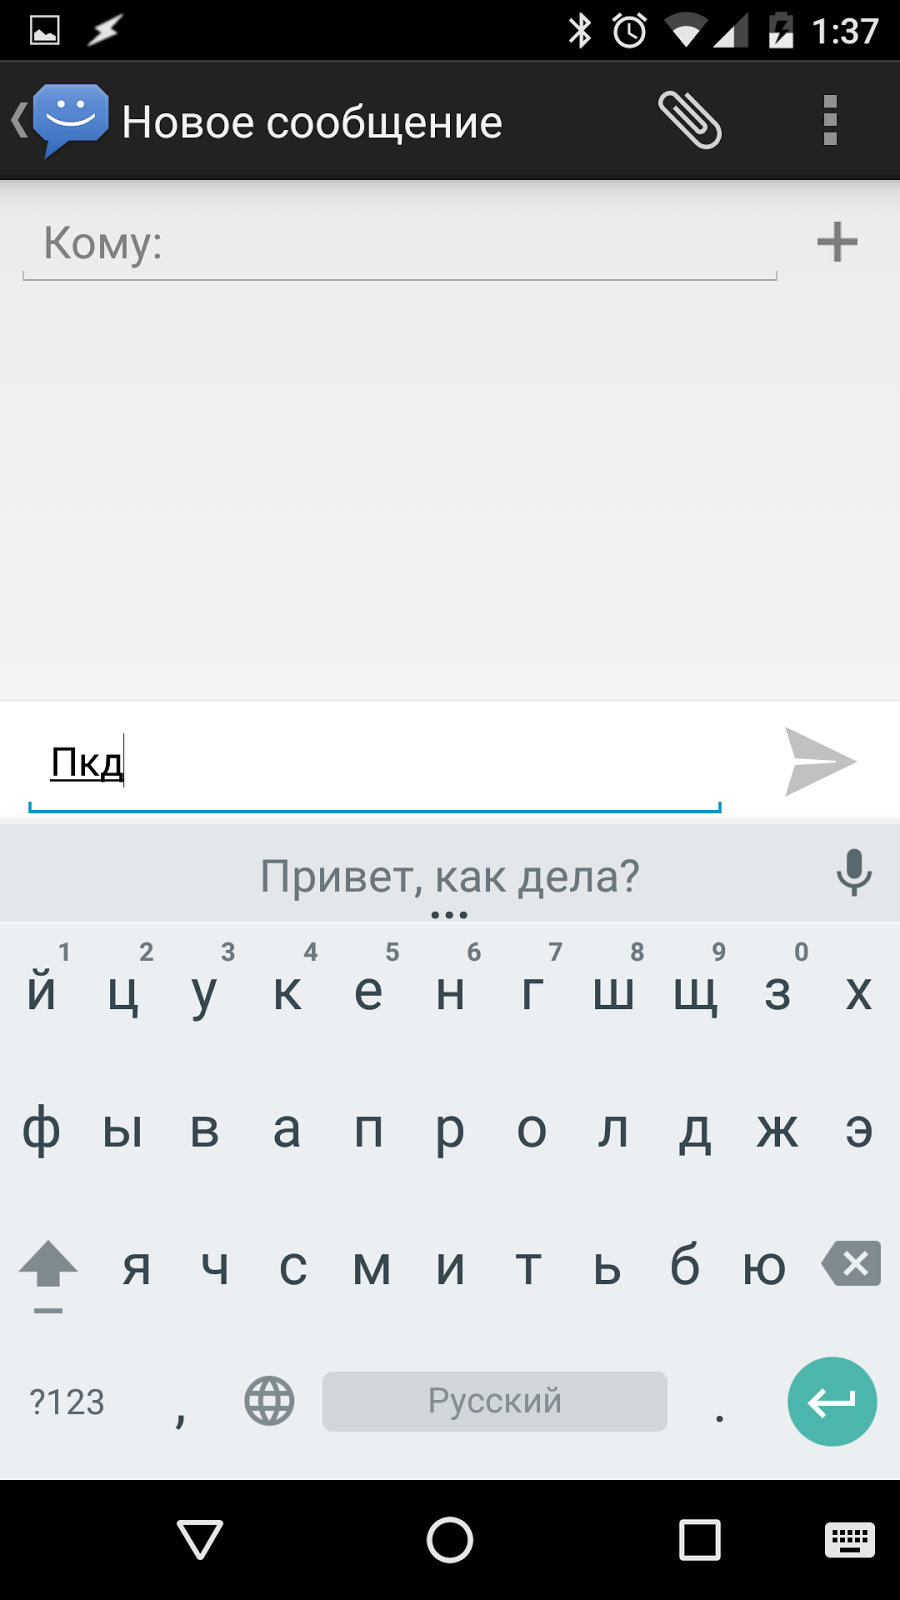 кириллица клавиатуры номеронабирателя андроид консультация телефону